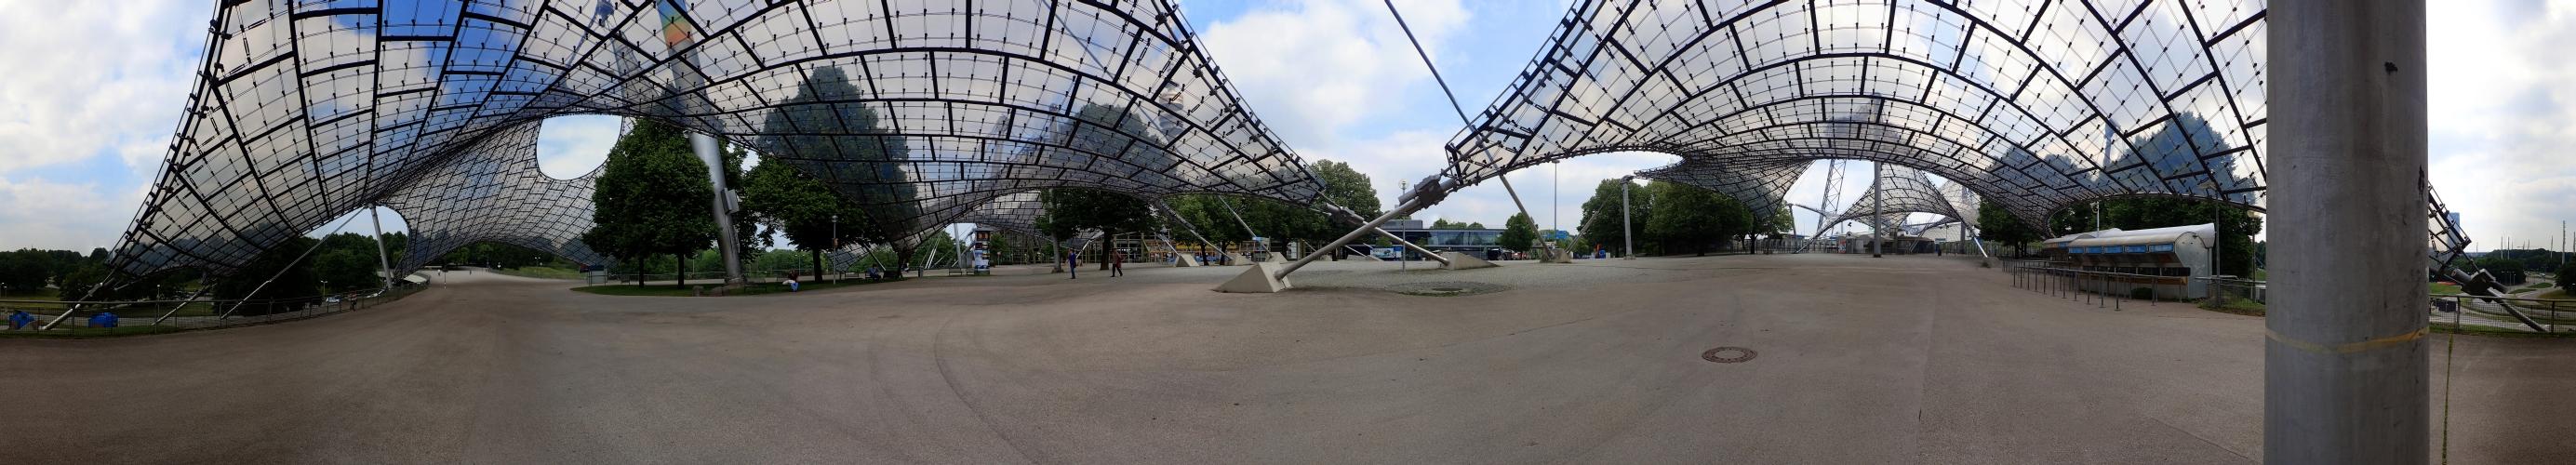 360 Grad unterm Zeltdach